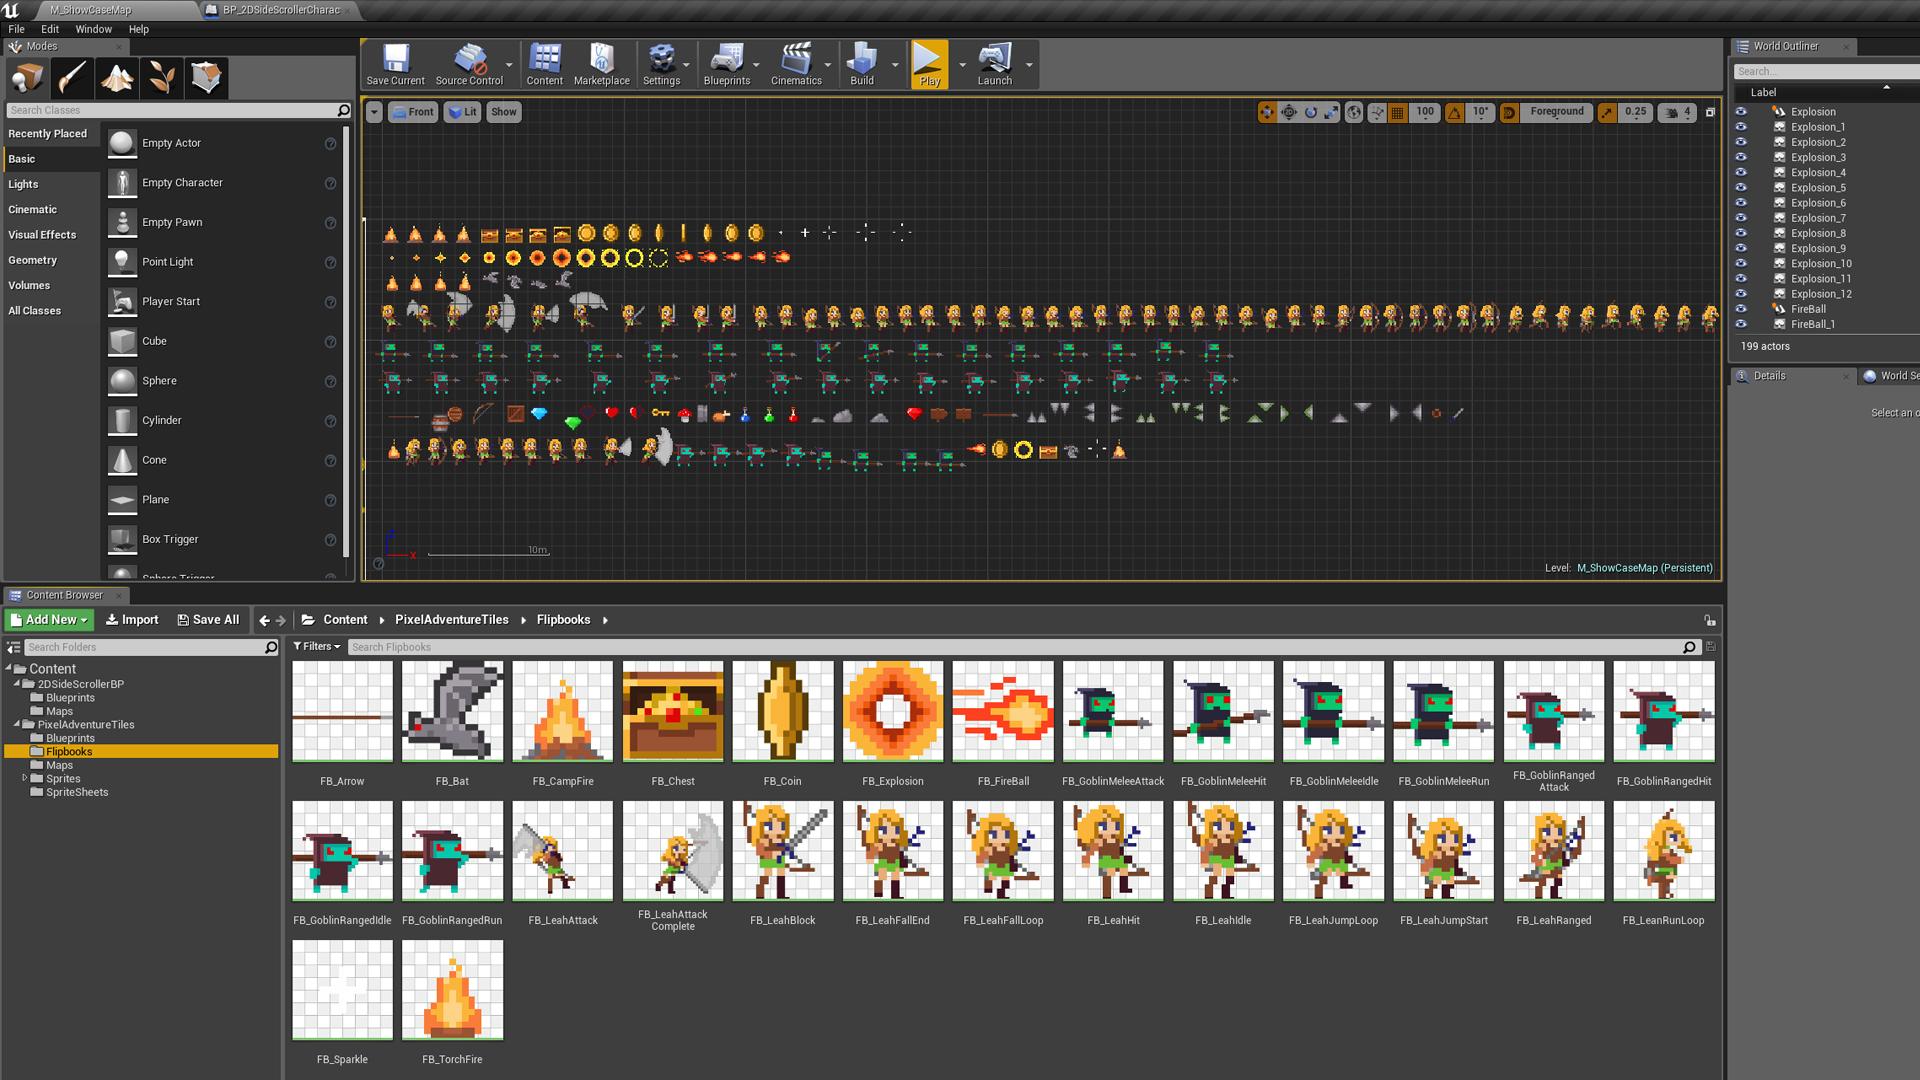 Pixel Platformer Tiles by Polyart Studio in 2D Assets - UE4